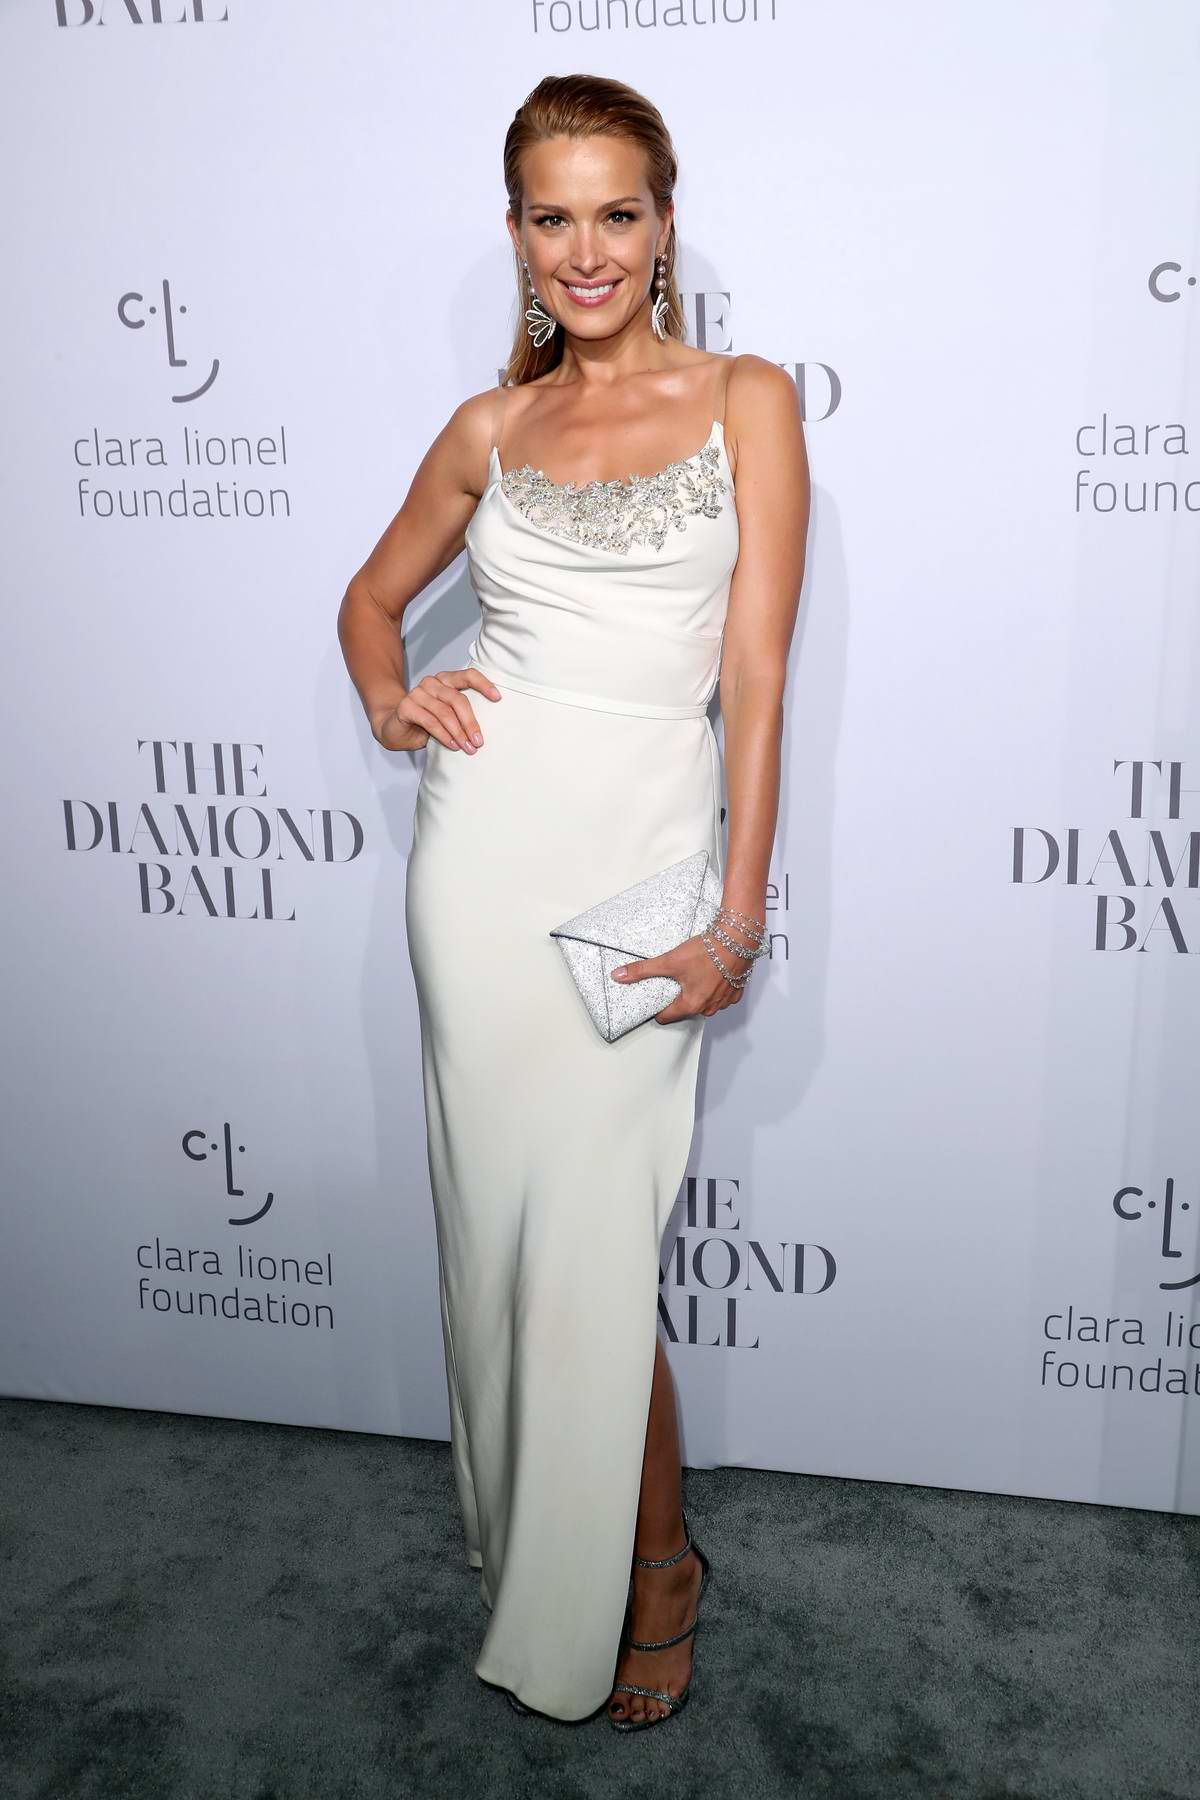 Petra Nemcova at Rihanna's 3rd Annual Clara Lionel Foundation Diamond ball at Cipriani, Wall Street, New York